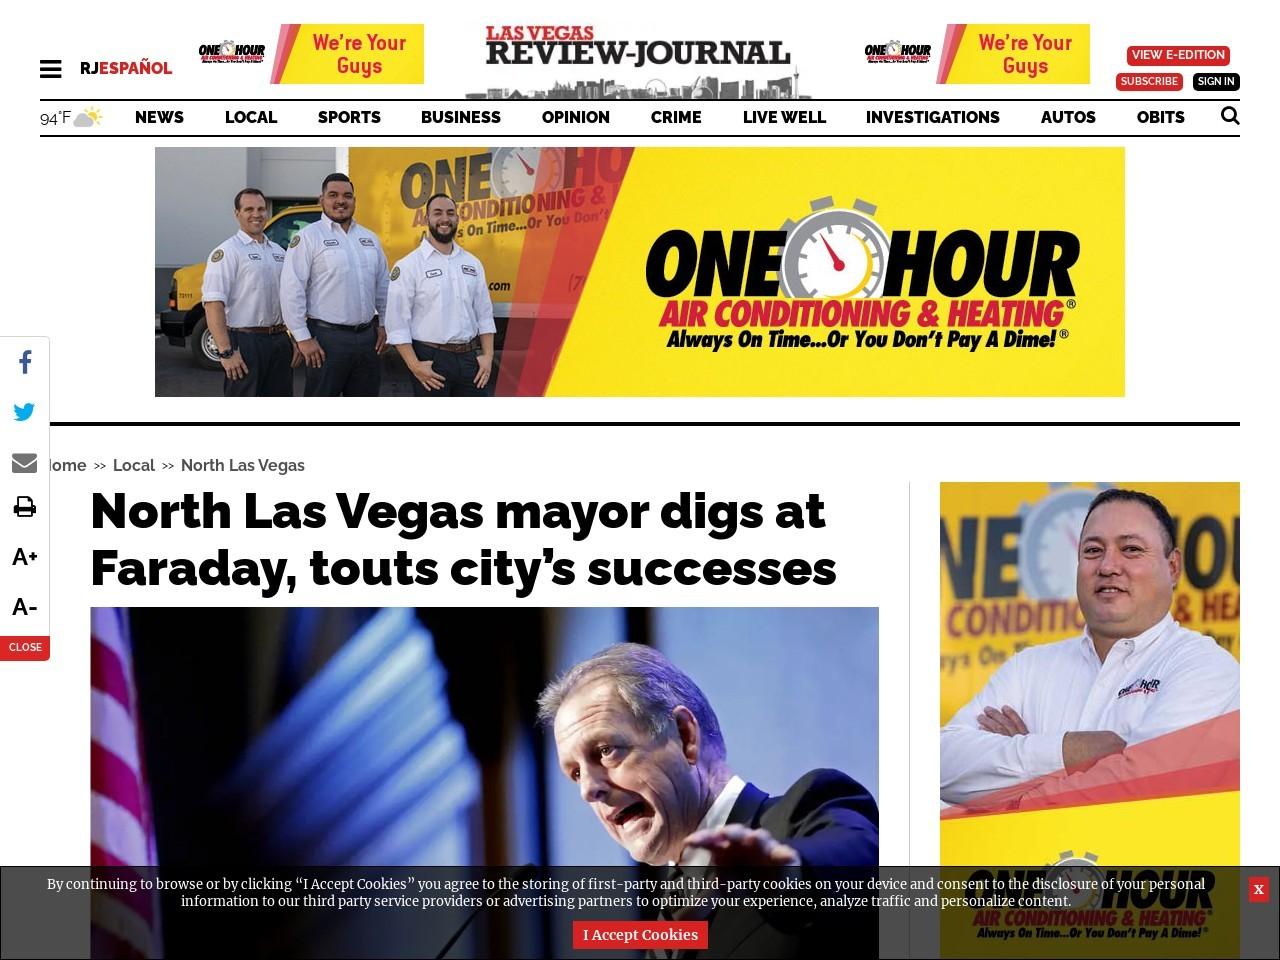 North Las Vegas mayor digs at Faraday, touts city's successes